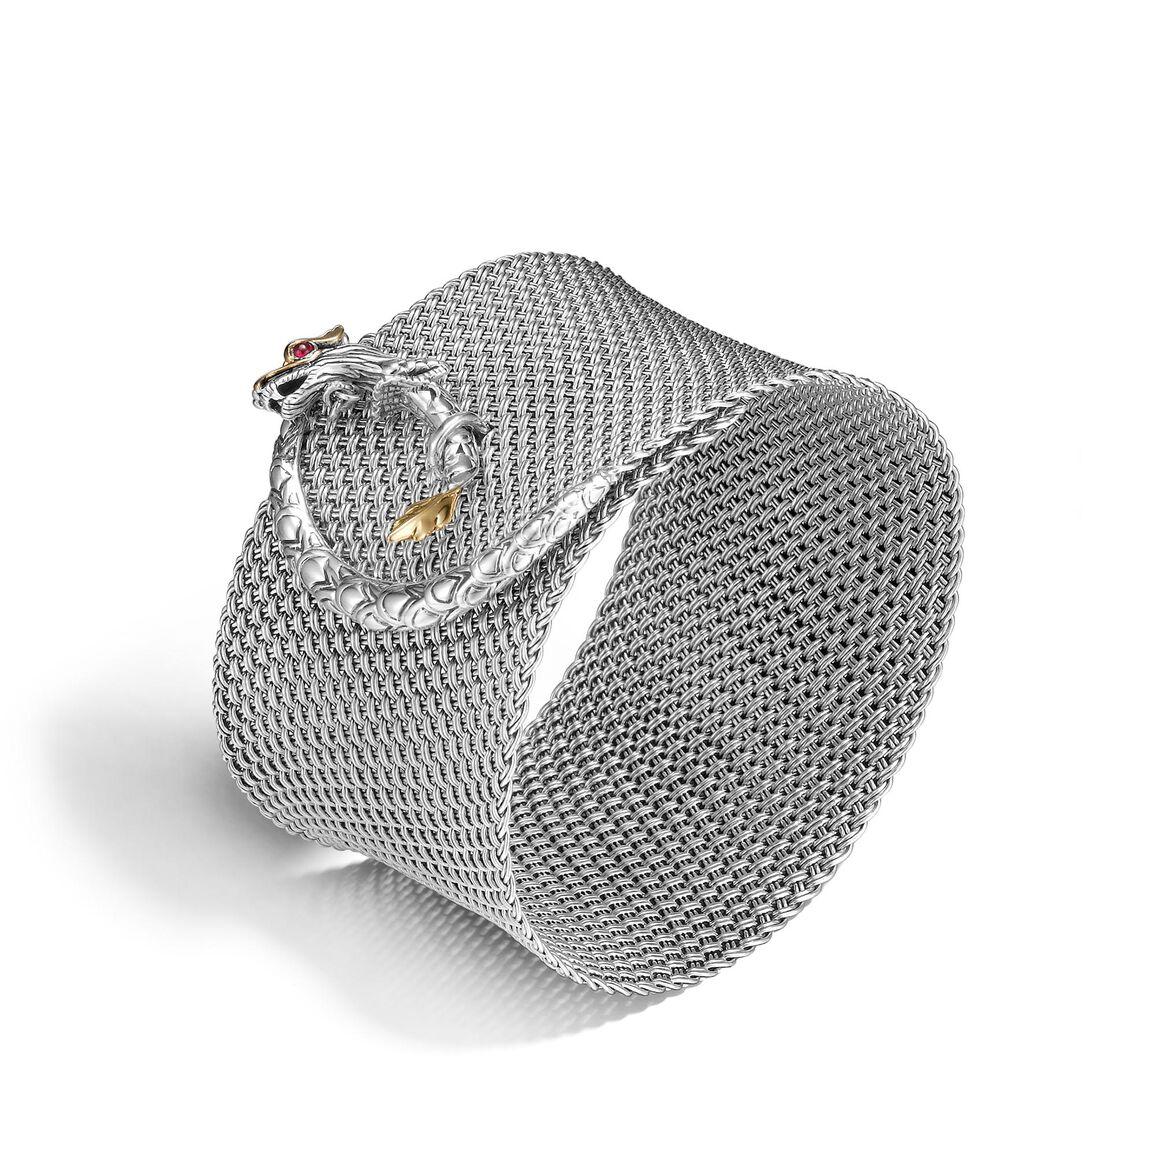 Legends Naga 39MM Cuff Bracelet in Silver and 18K Gold